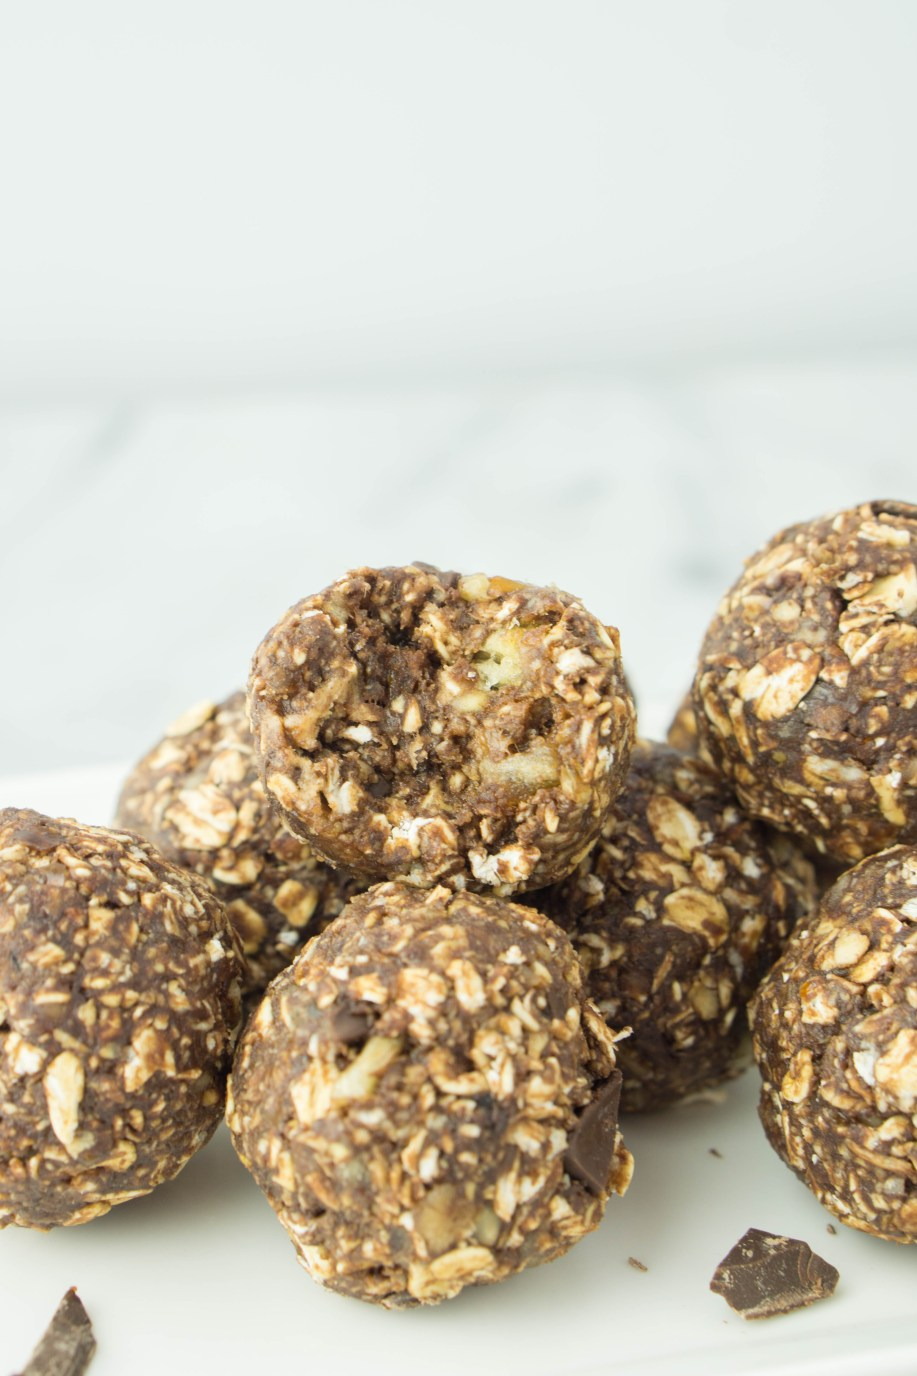 Chocolate Banana Energy Bites! #vegan #glutenfree #walnut #darkchocolate #dates #healthysnackideas | www.wakeuptowaffles.com